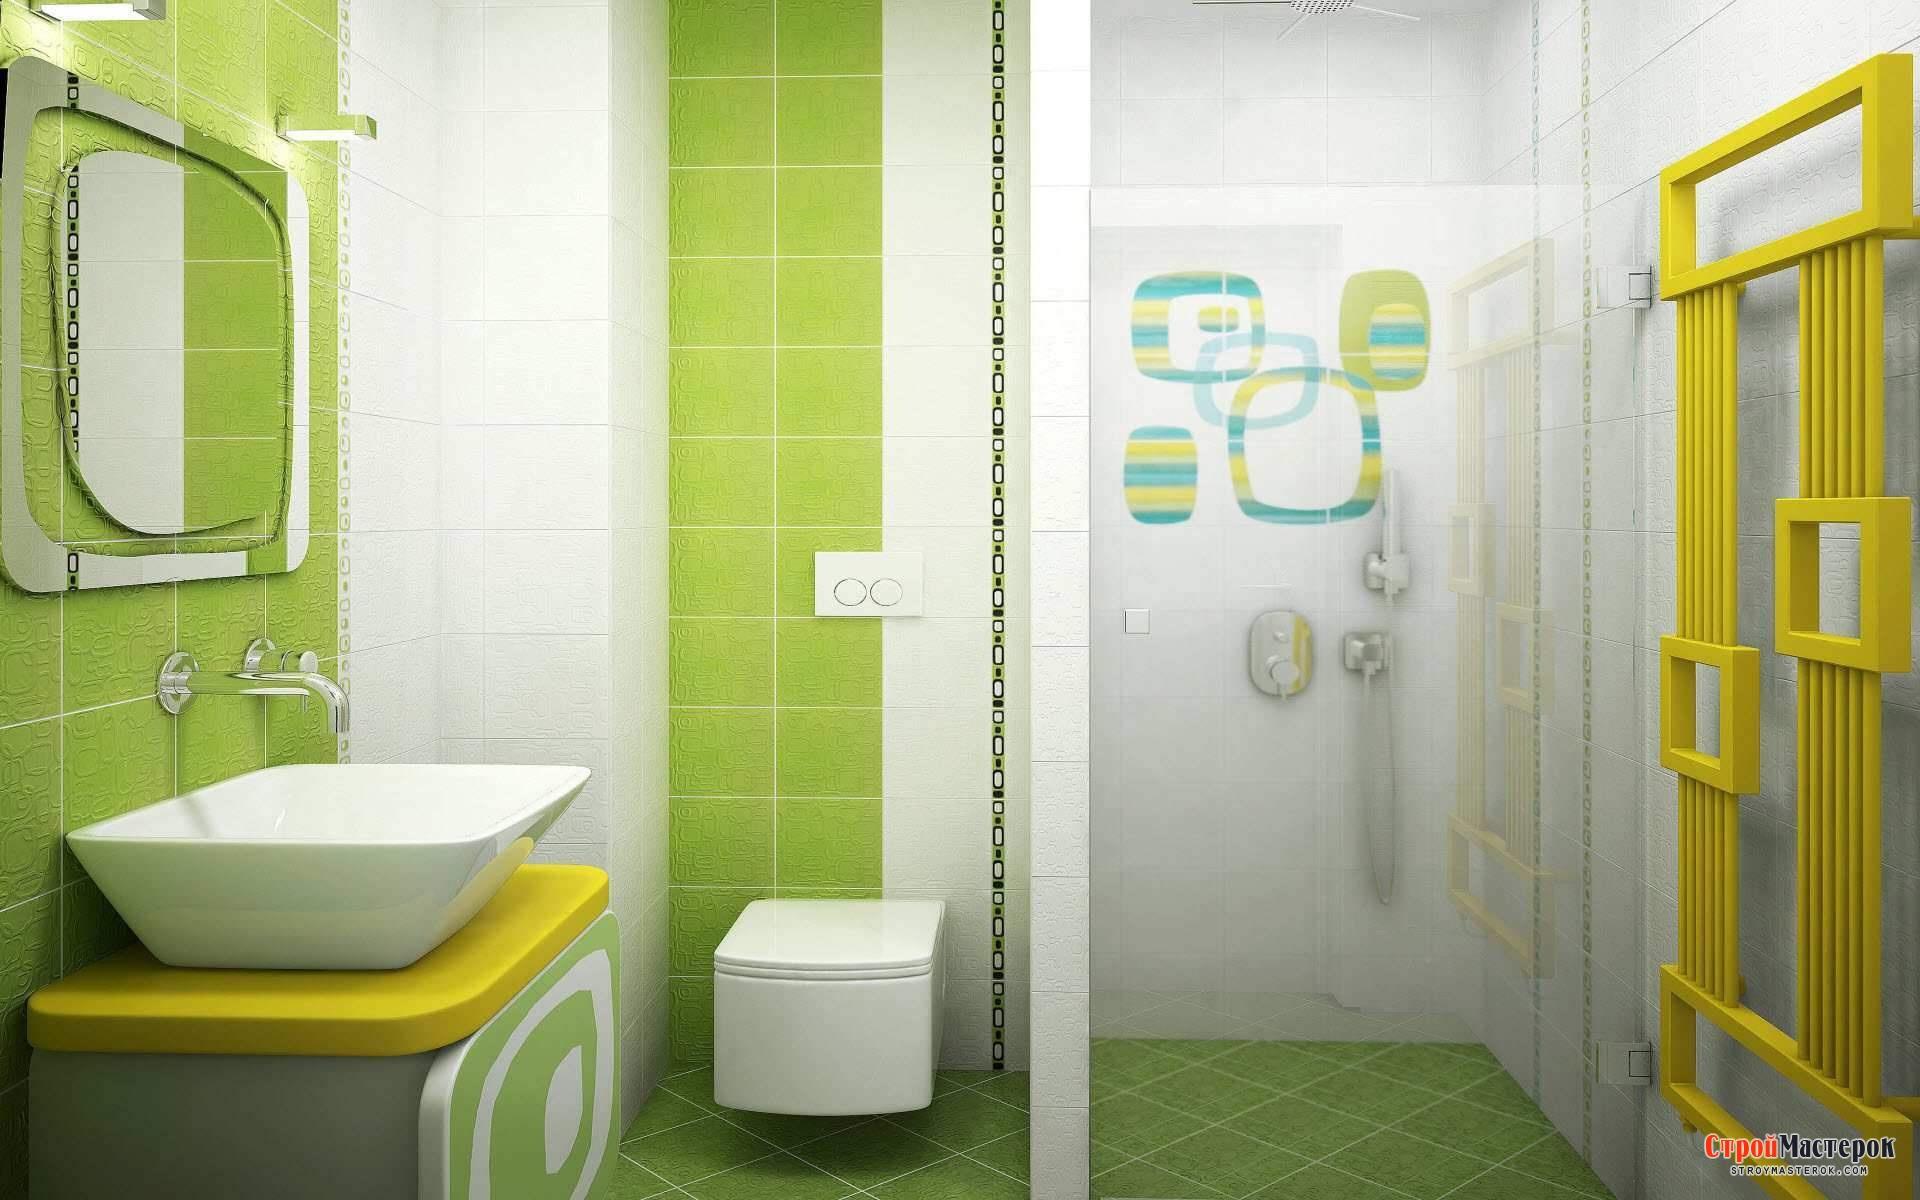 Модный дизайн ванной комнаты